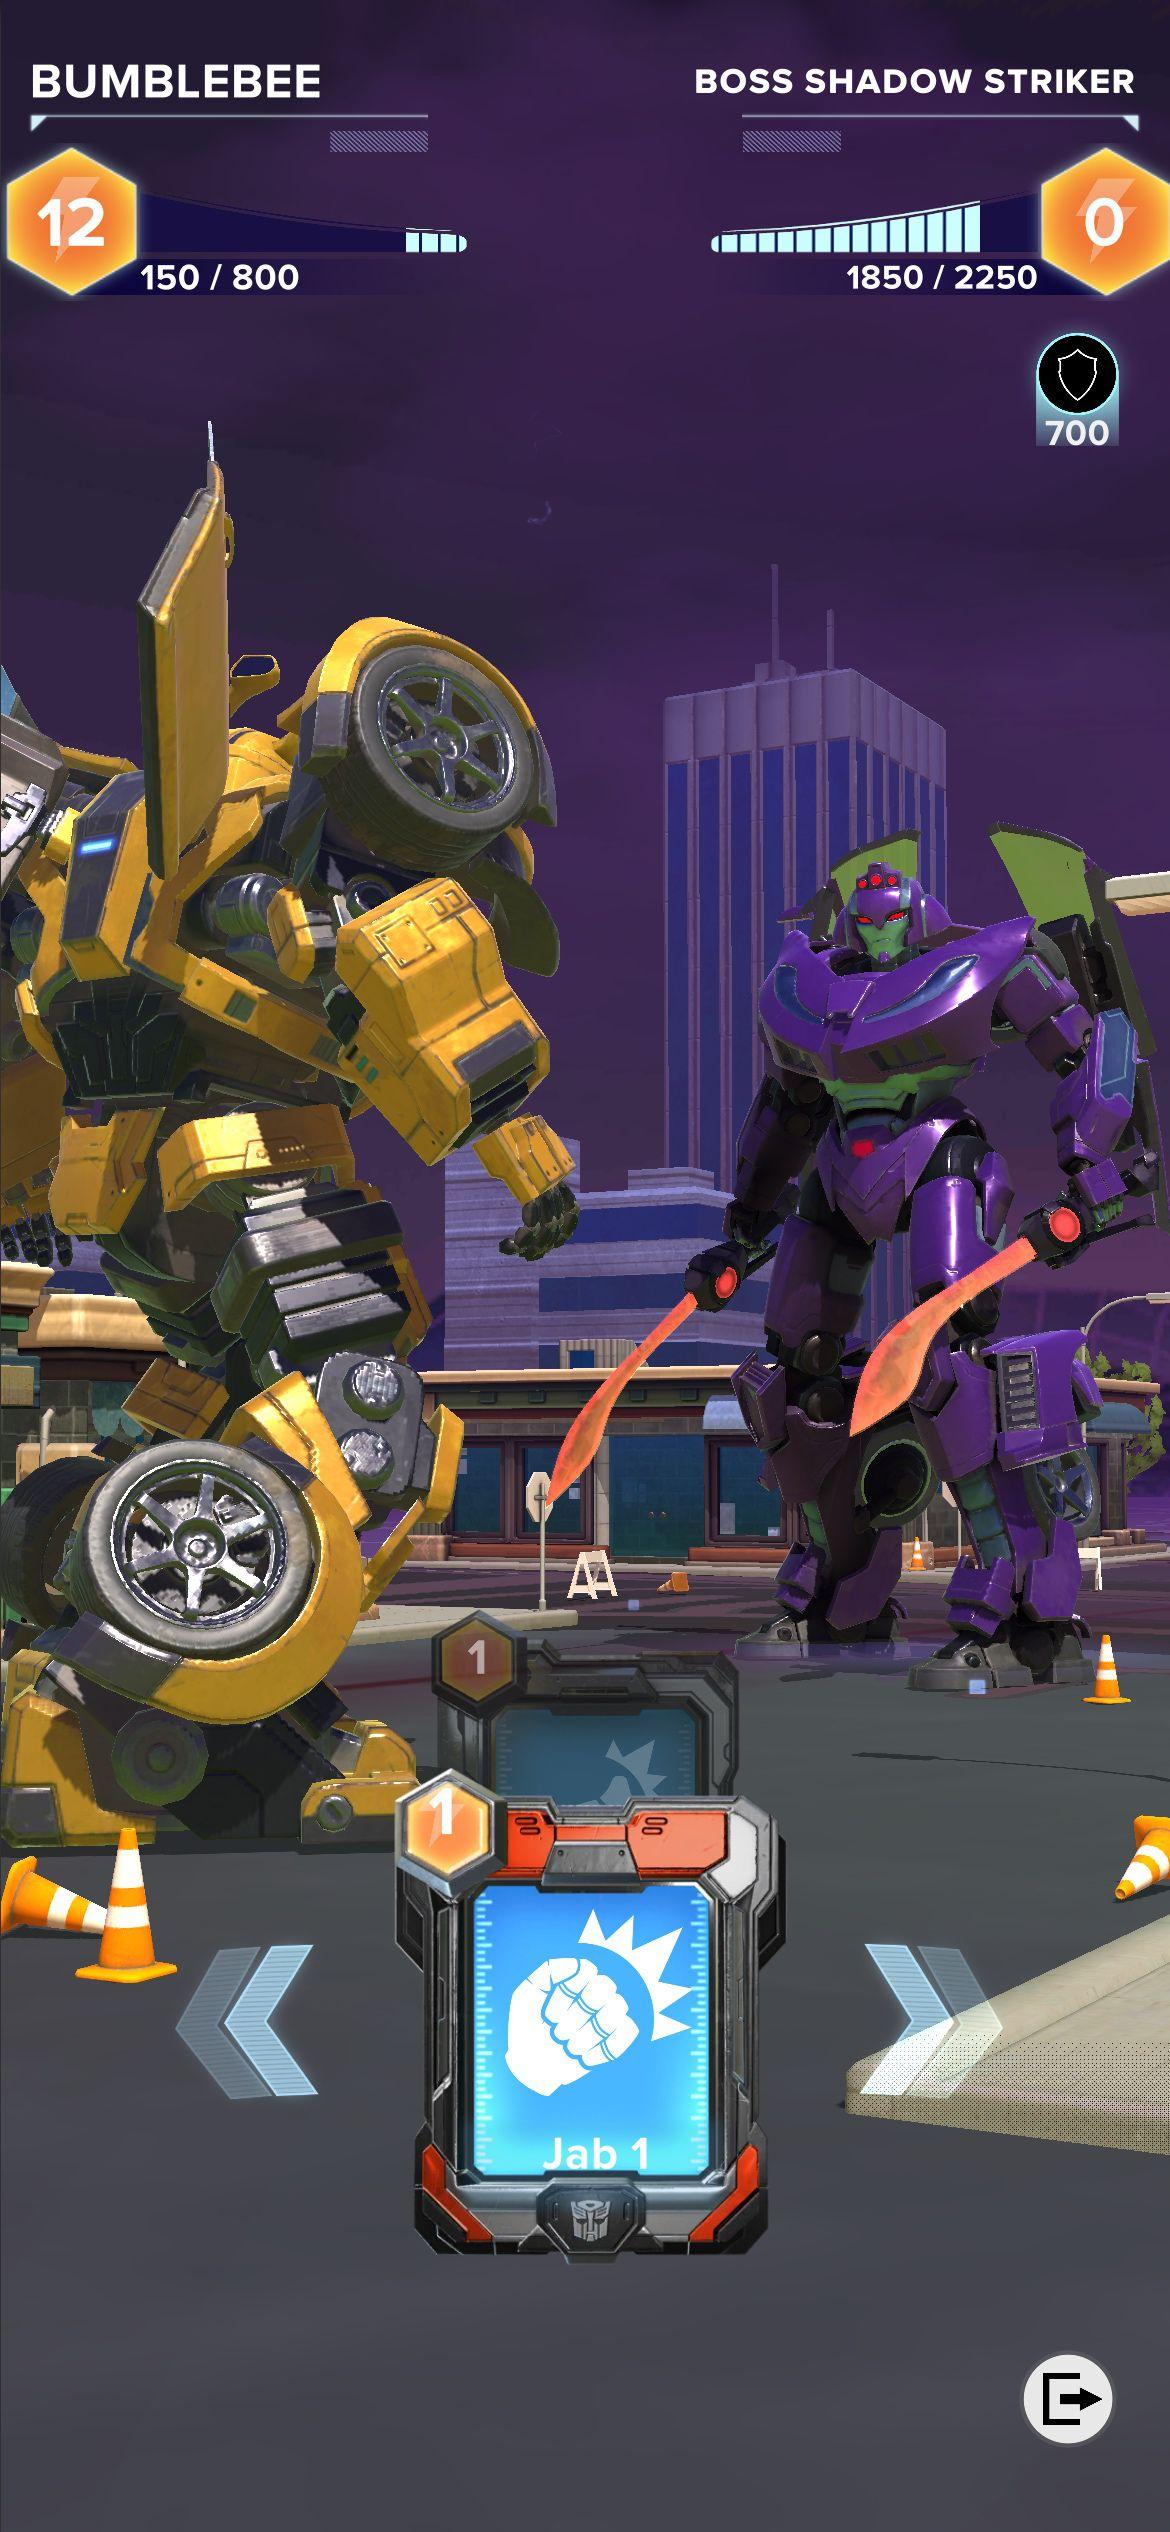 Pokémon Go creator Niantic announces Transformers: Heavy Metal AR game -  Polygon